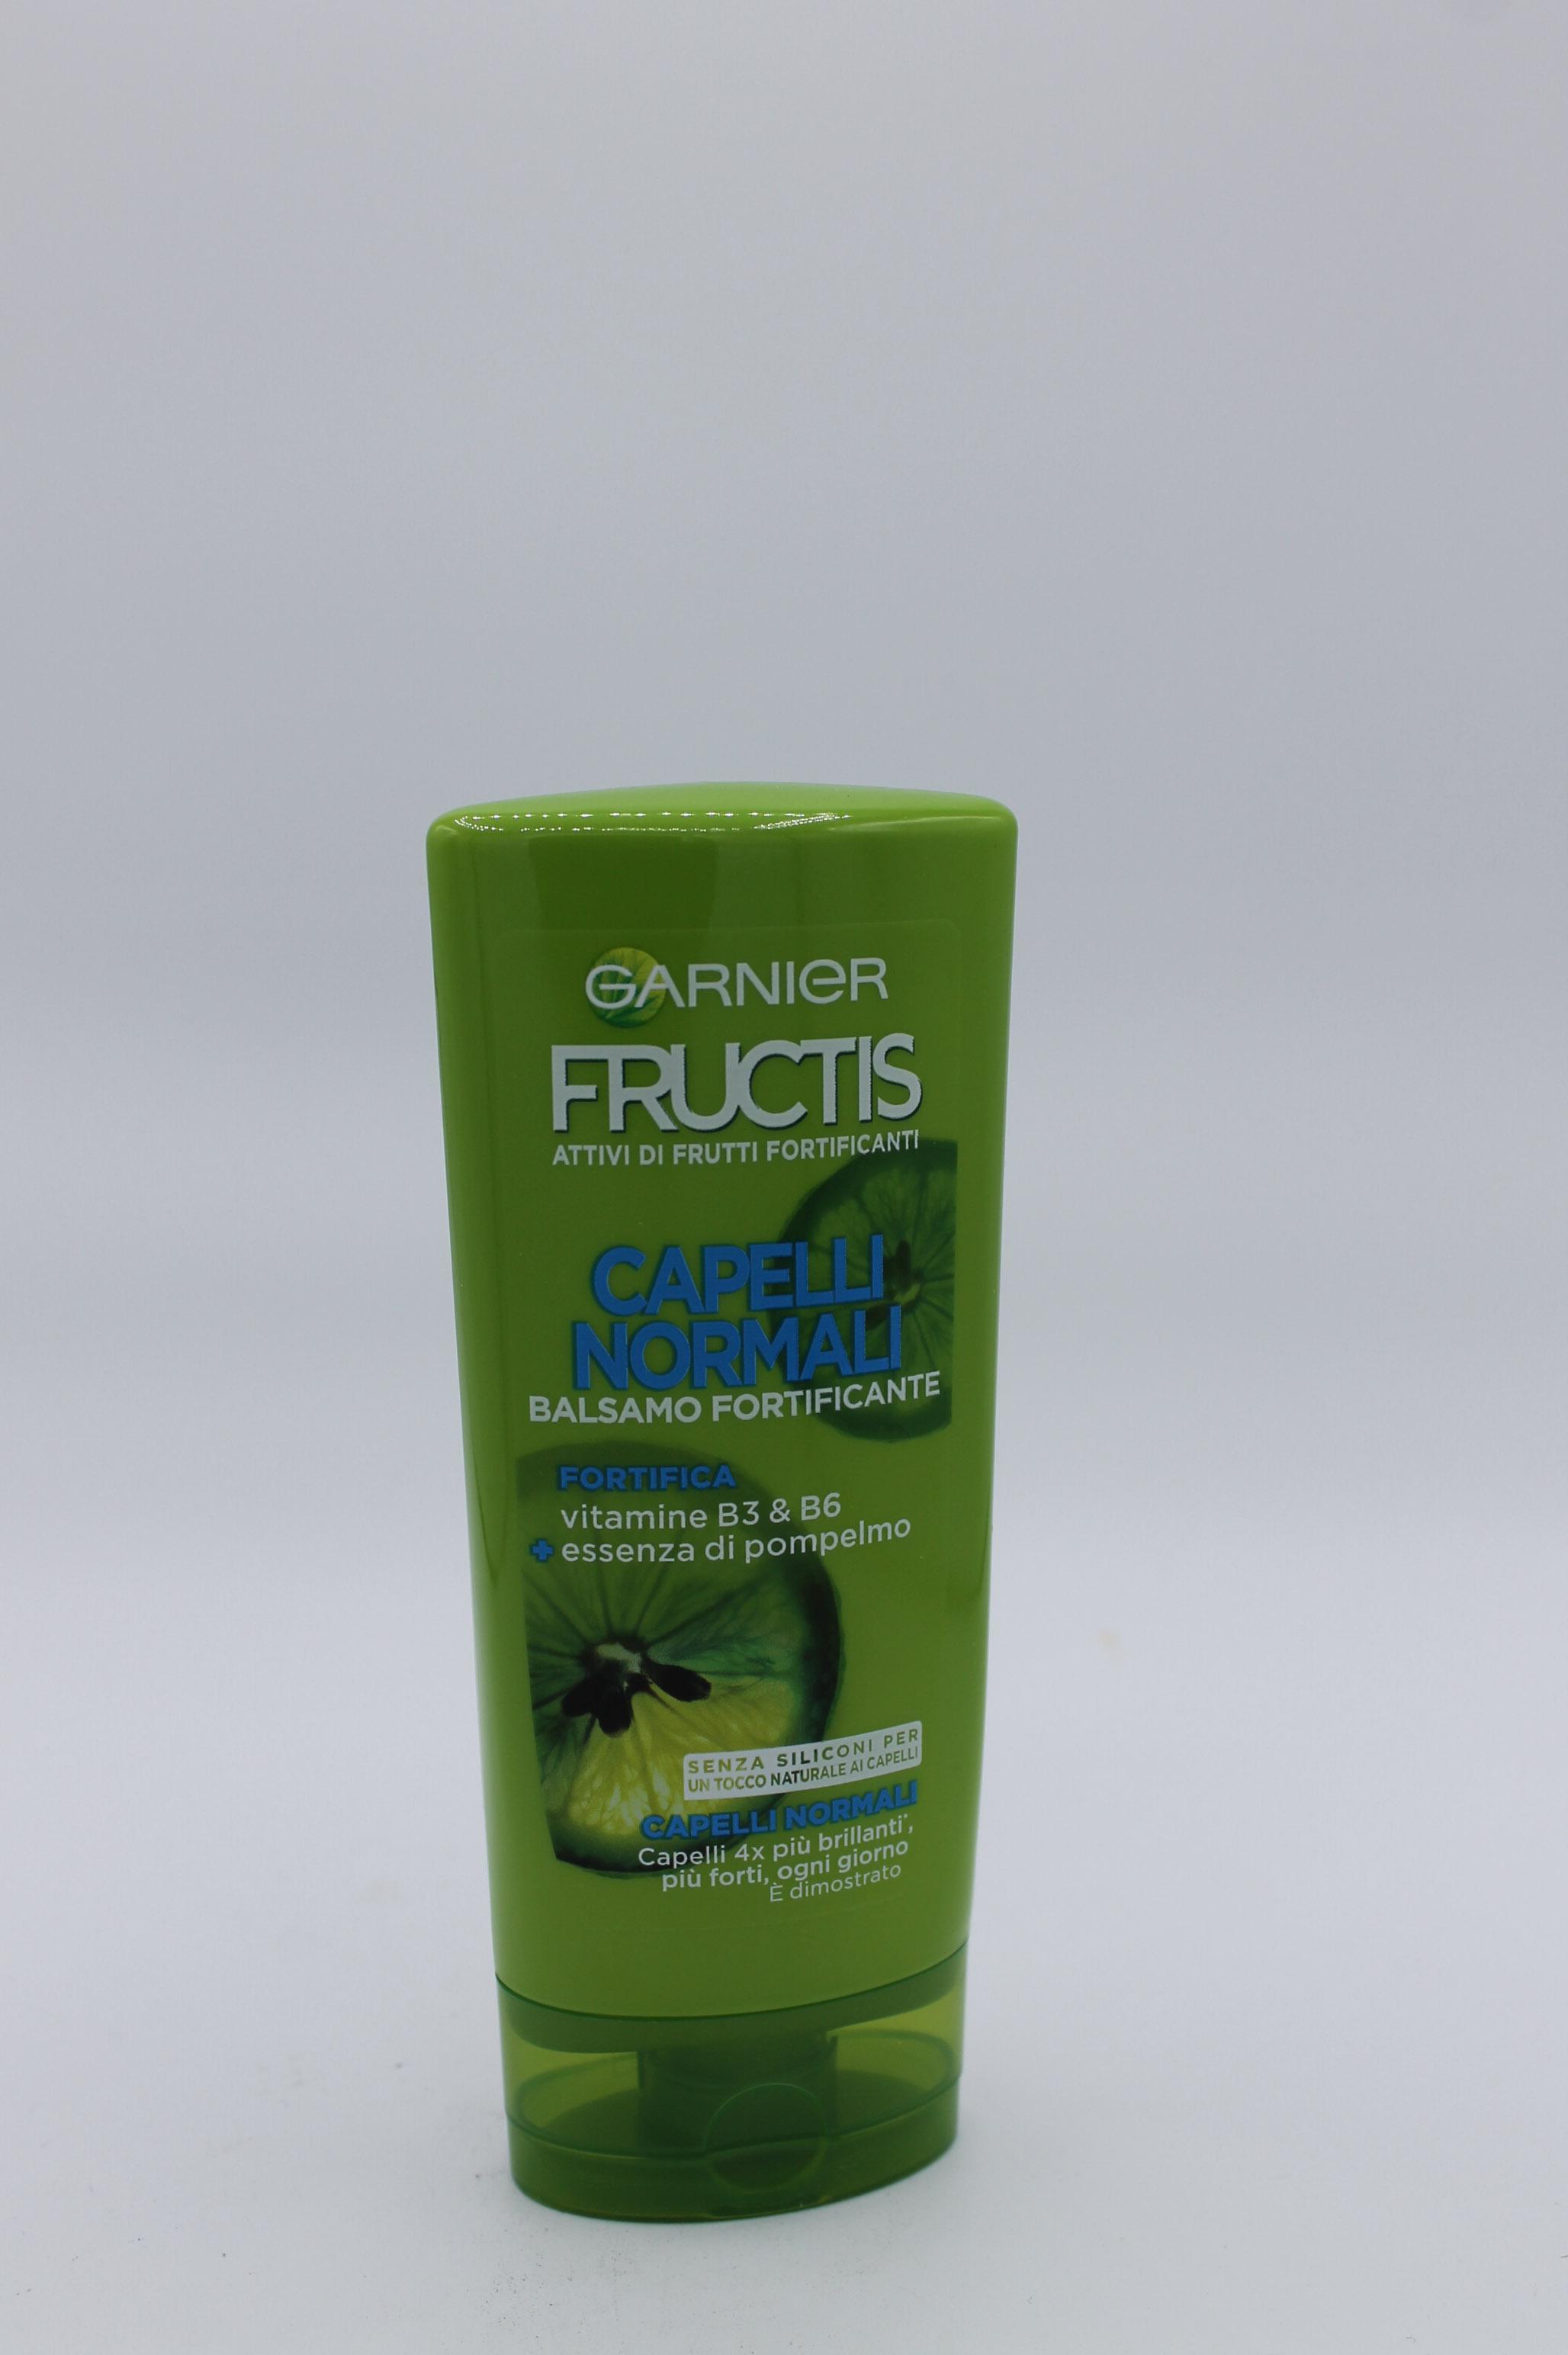 Garnier fructis balsamo 200ml vari tipi.